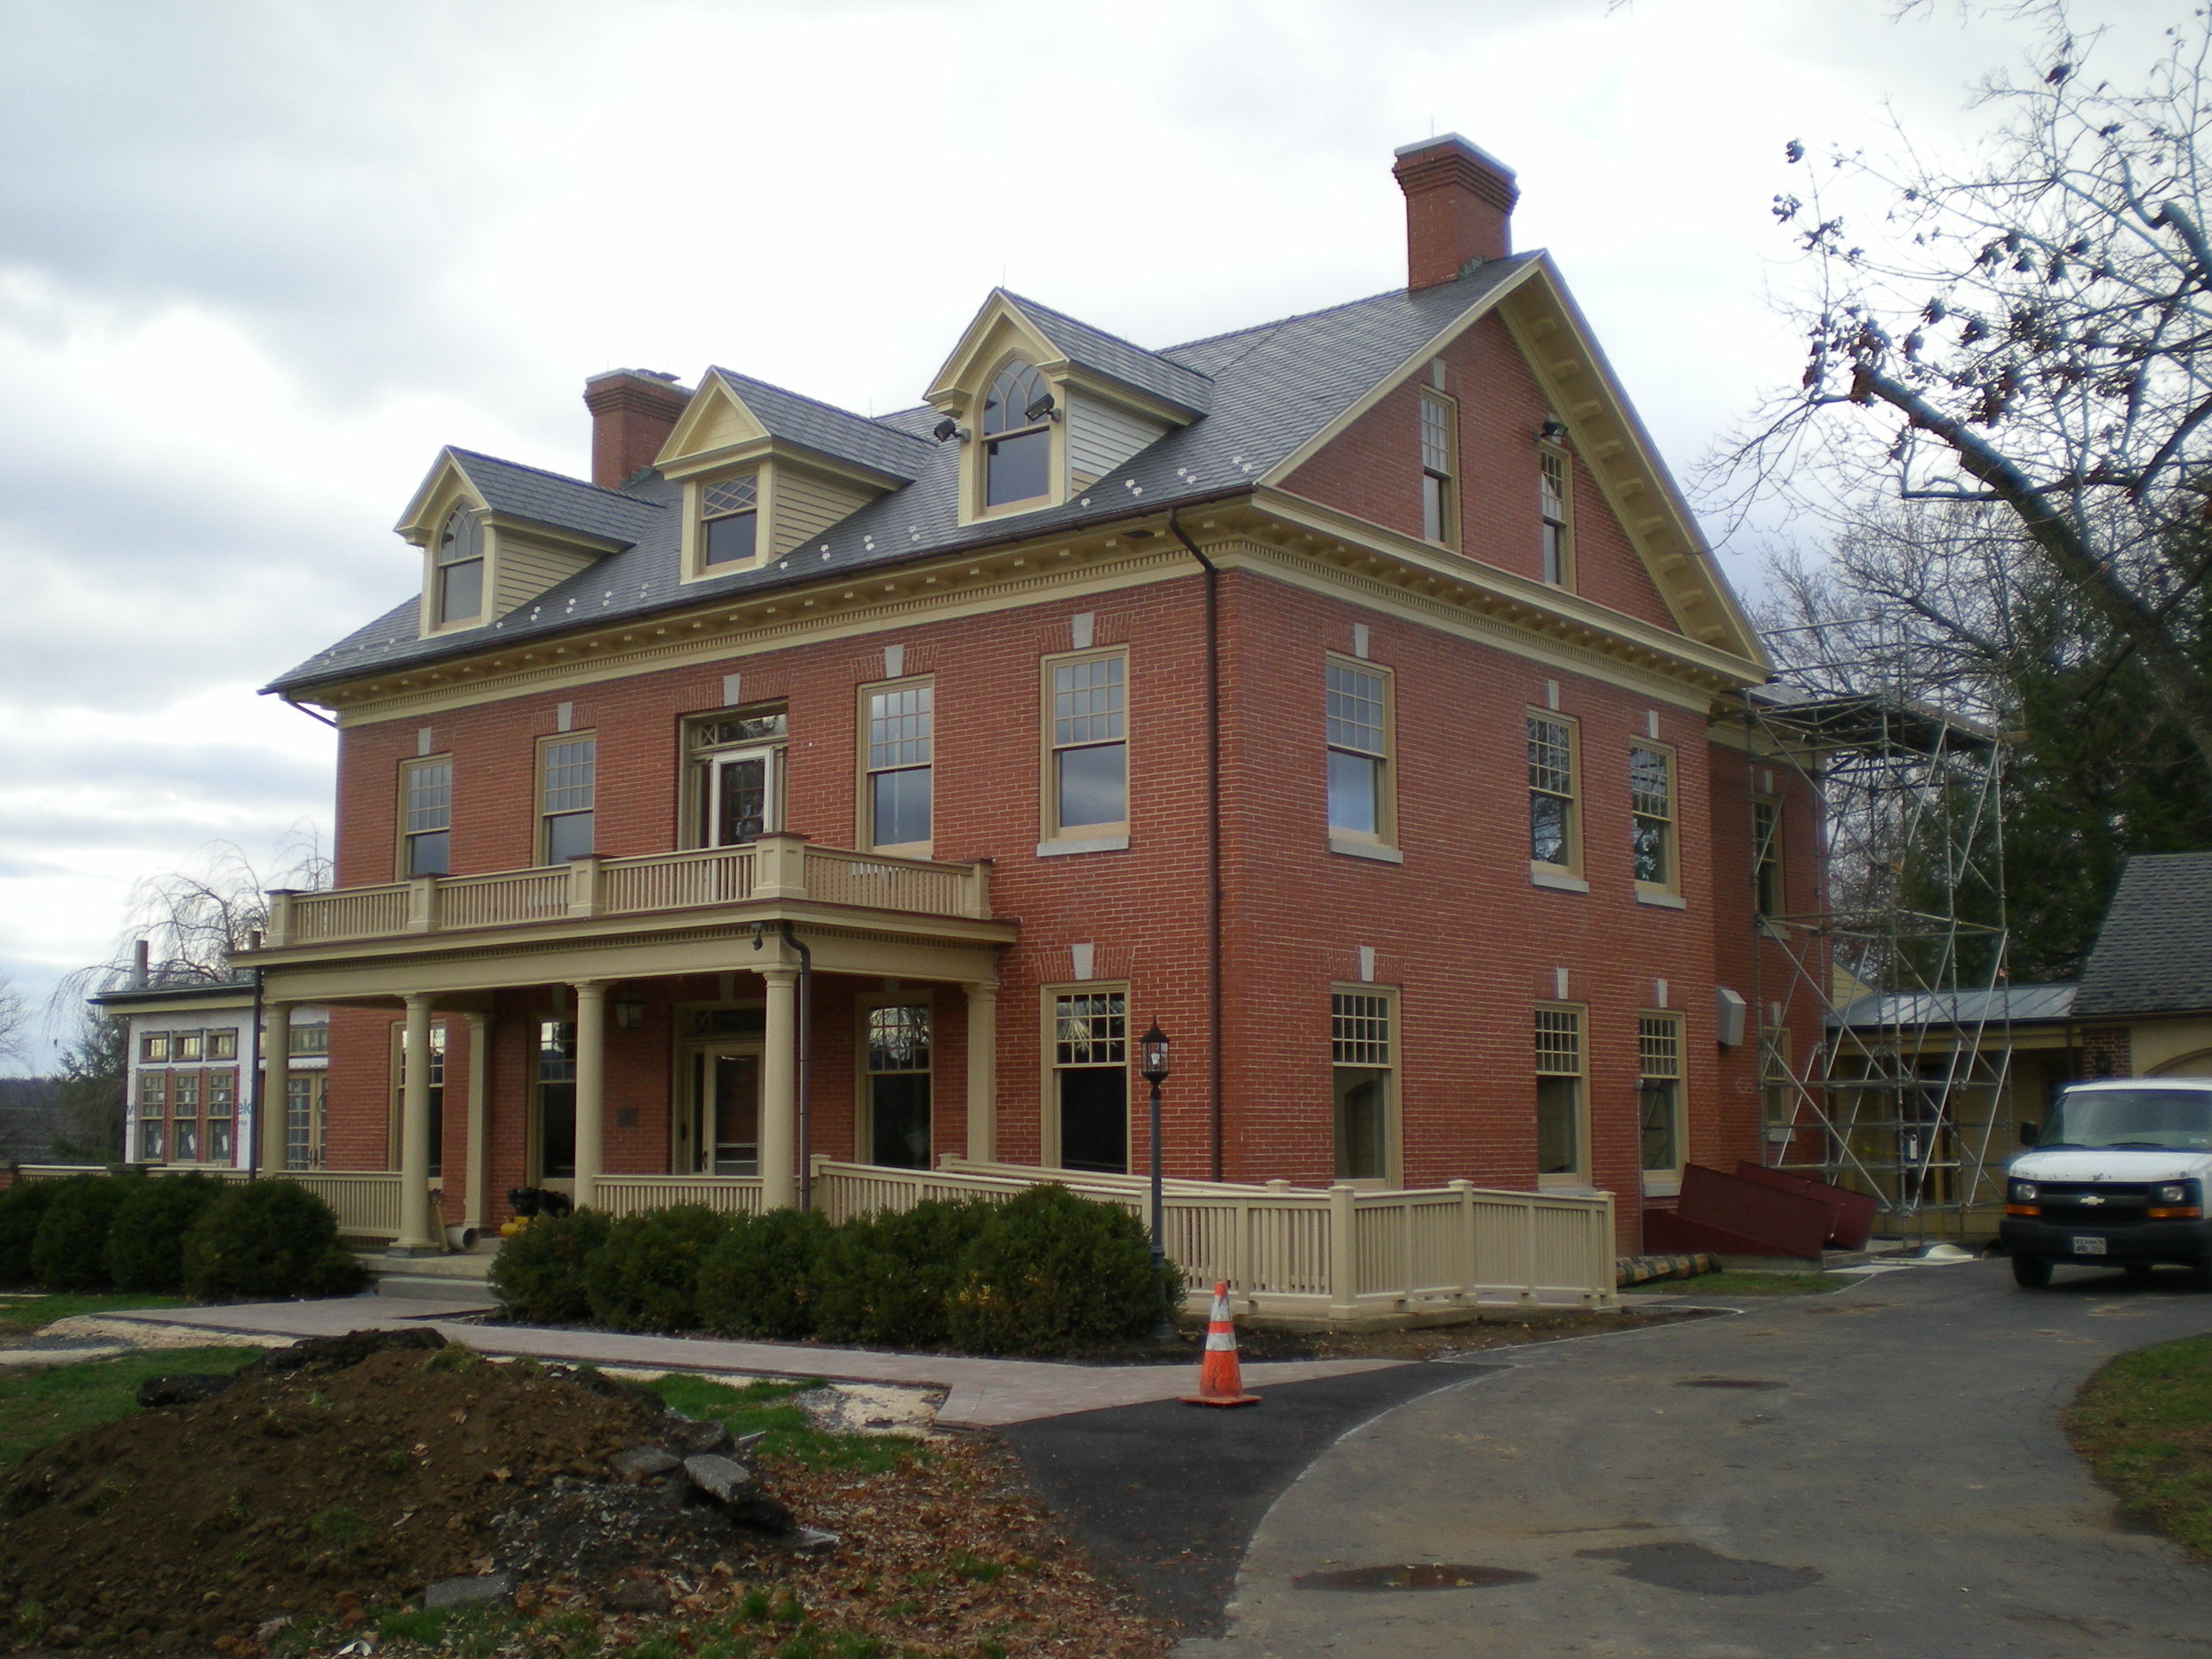 Shippensburg University's Martin House